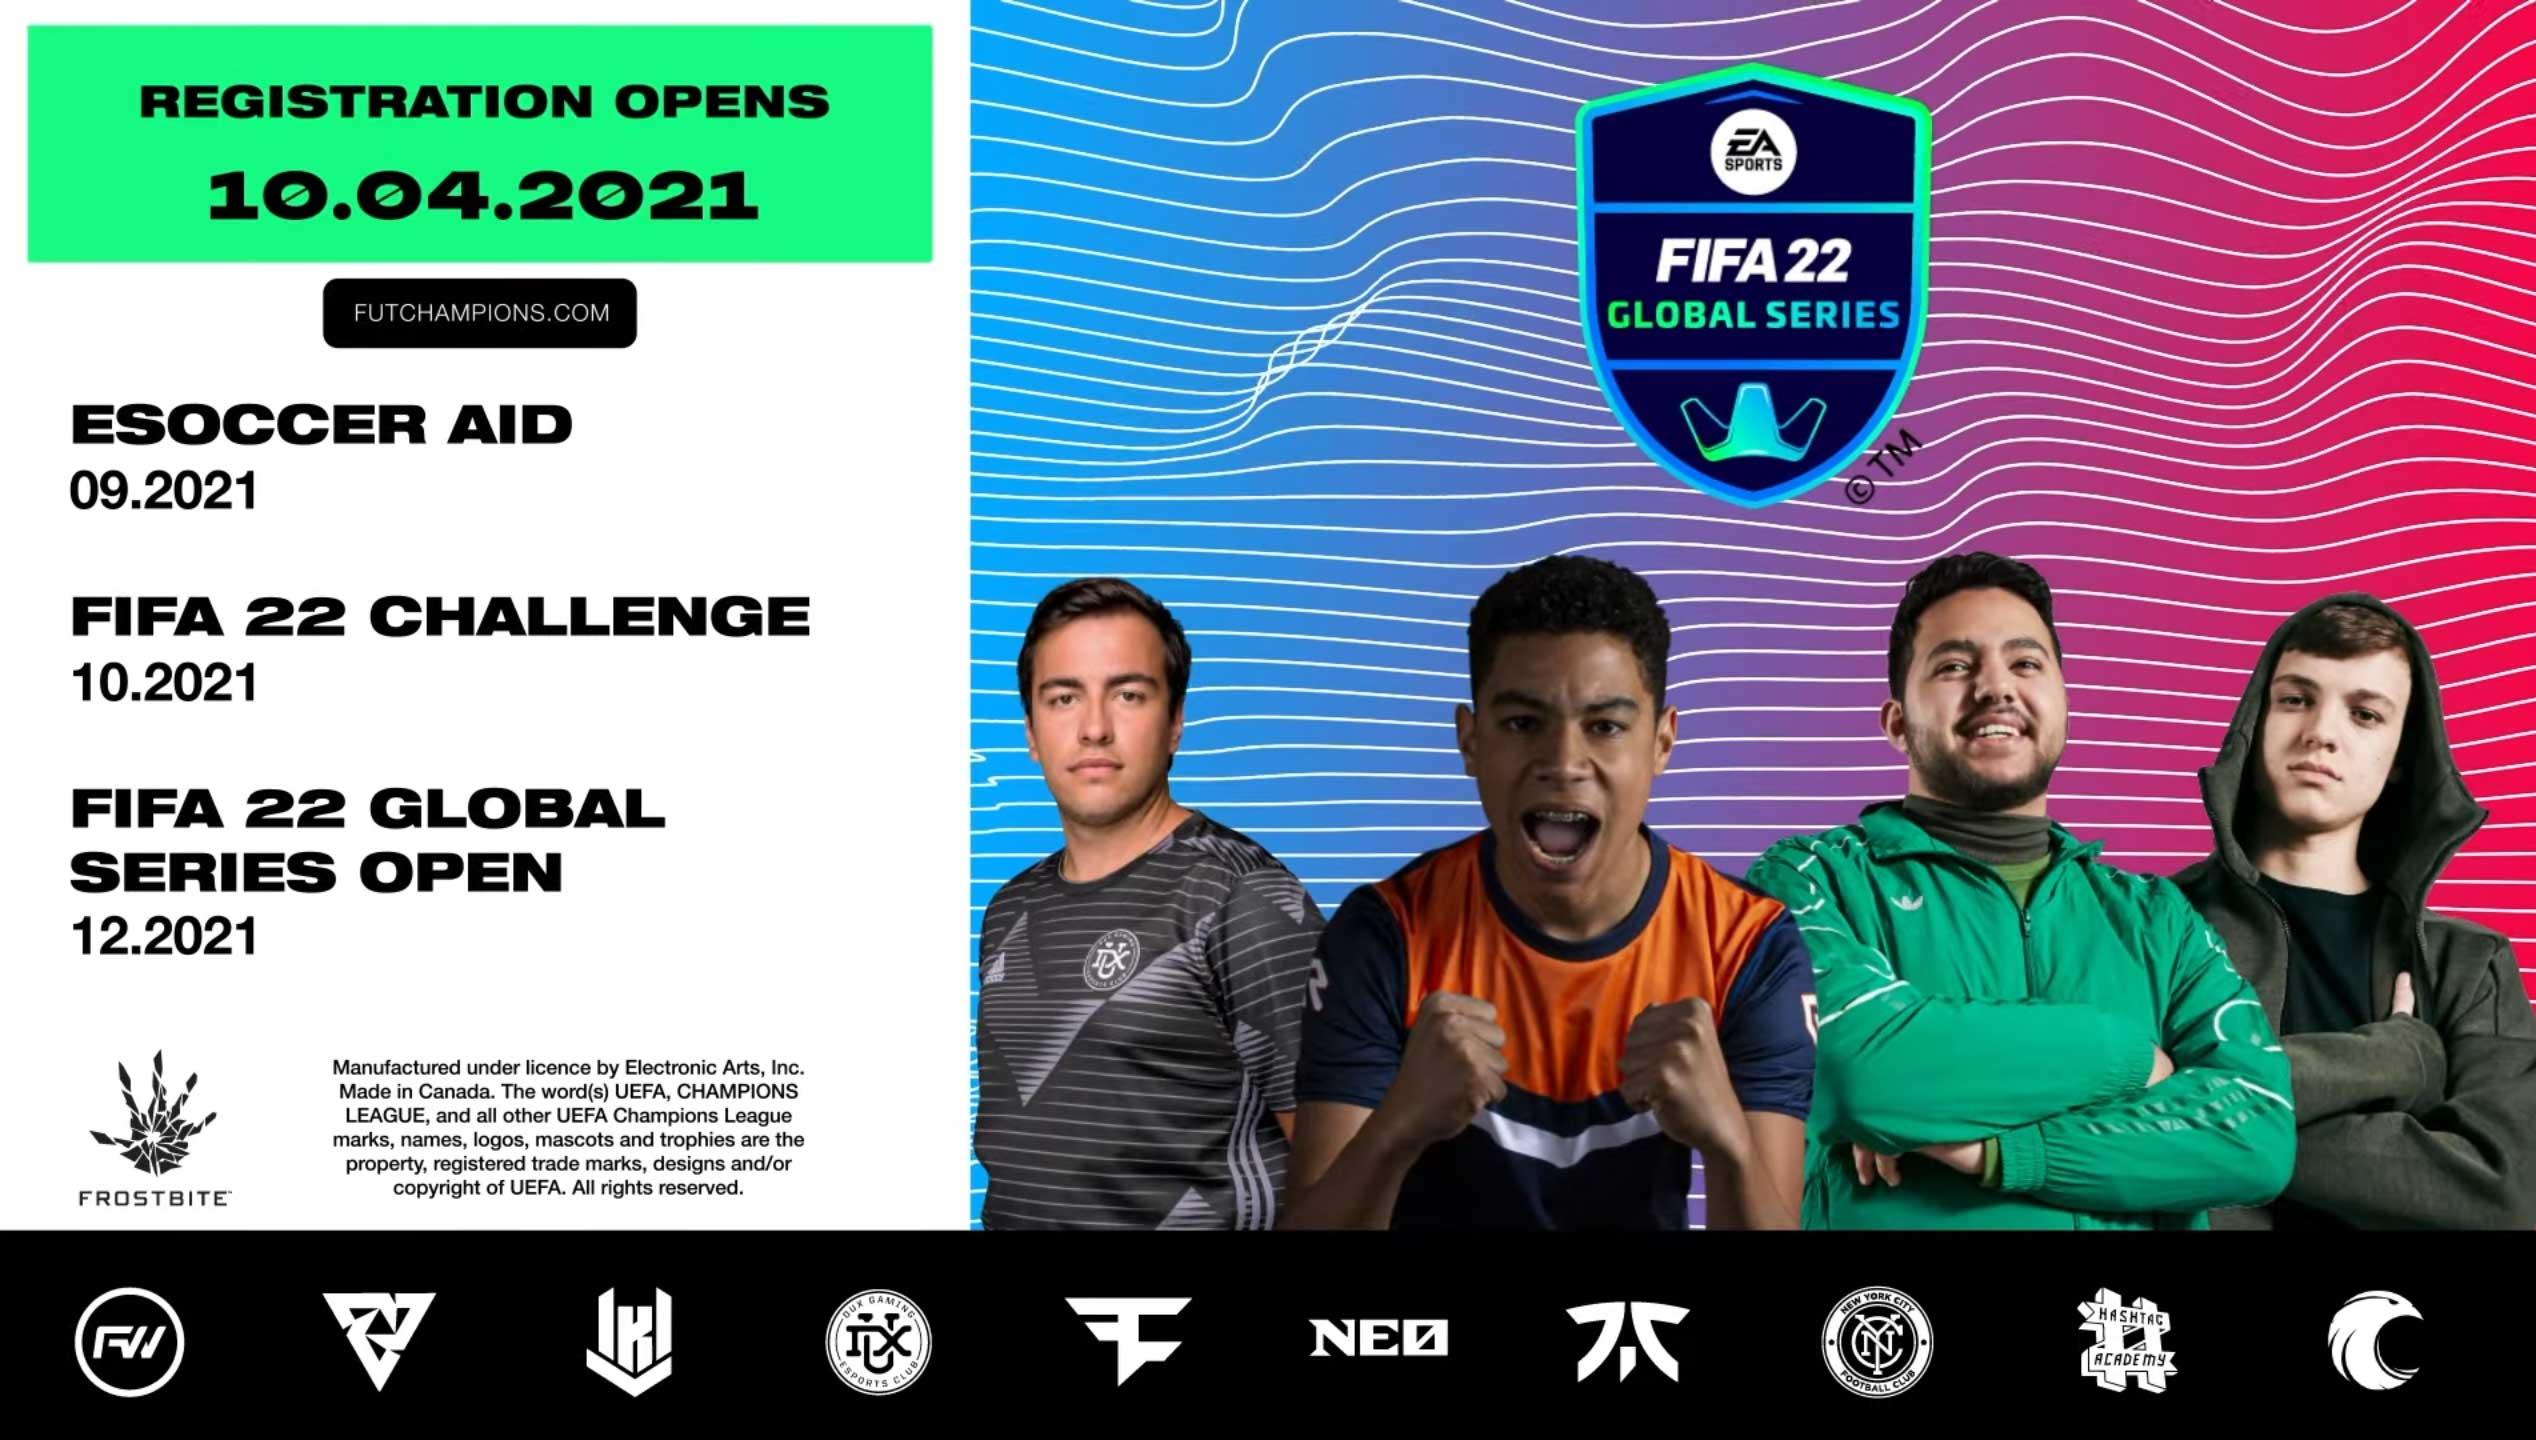 EA SPORTS FIFA 22 Global Series